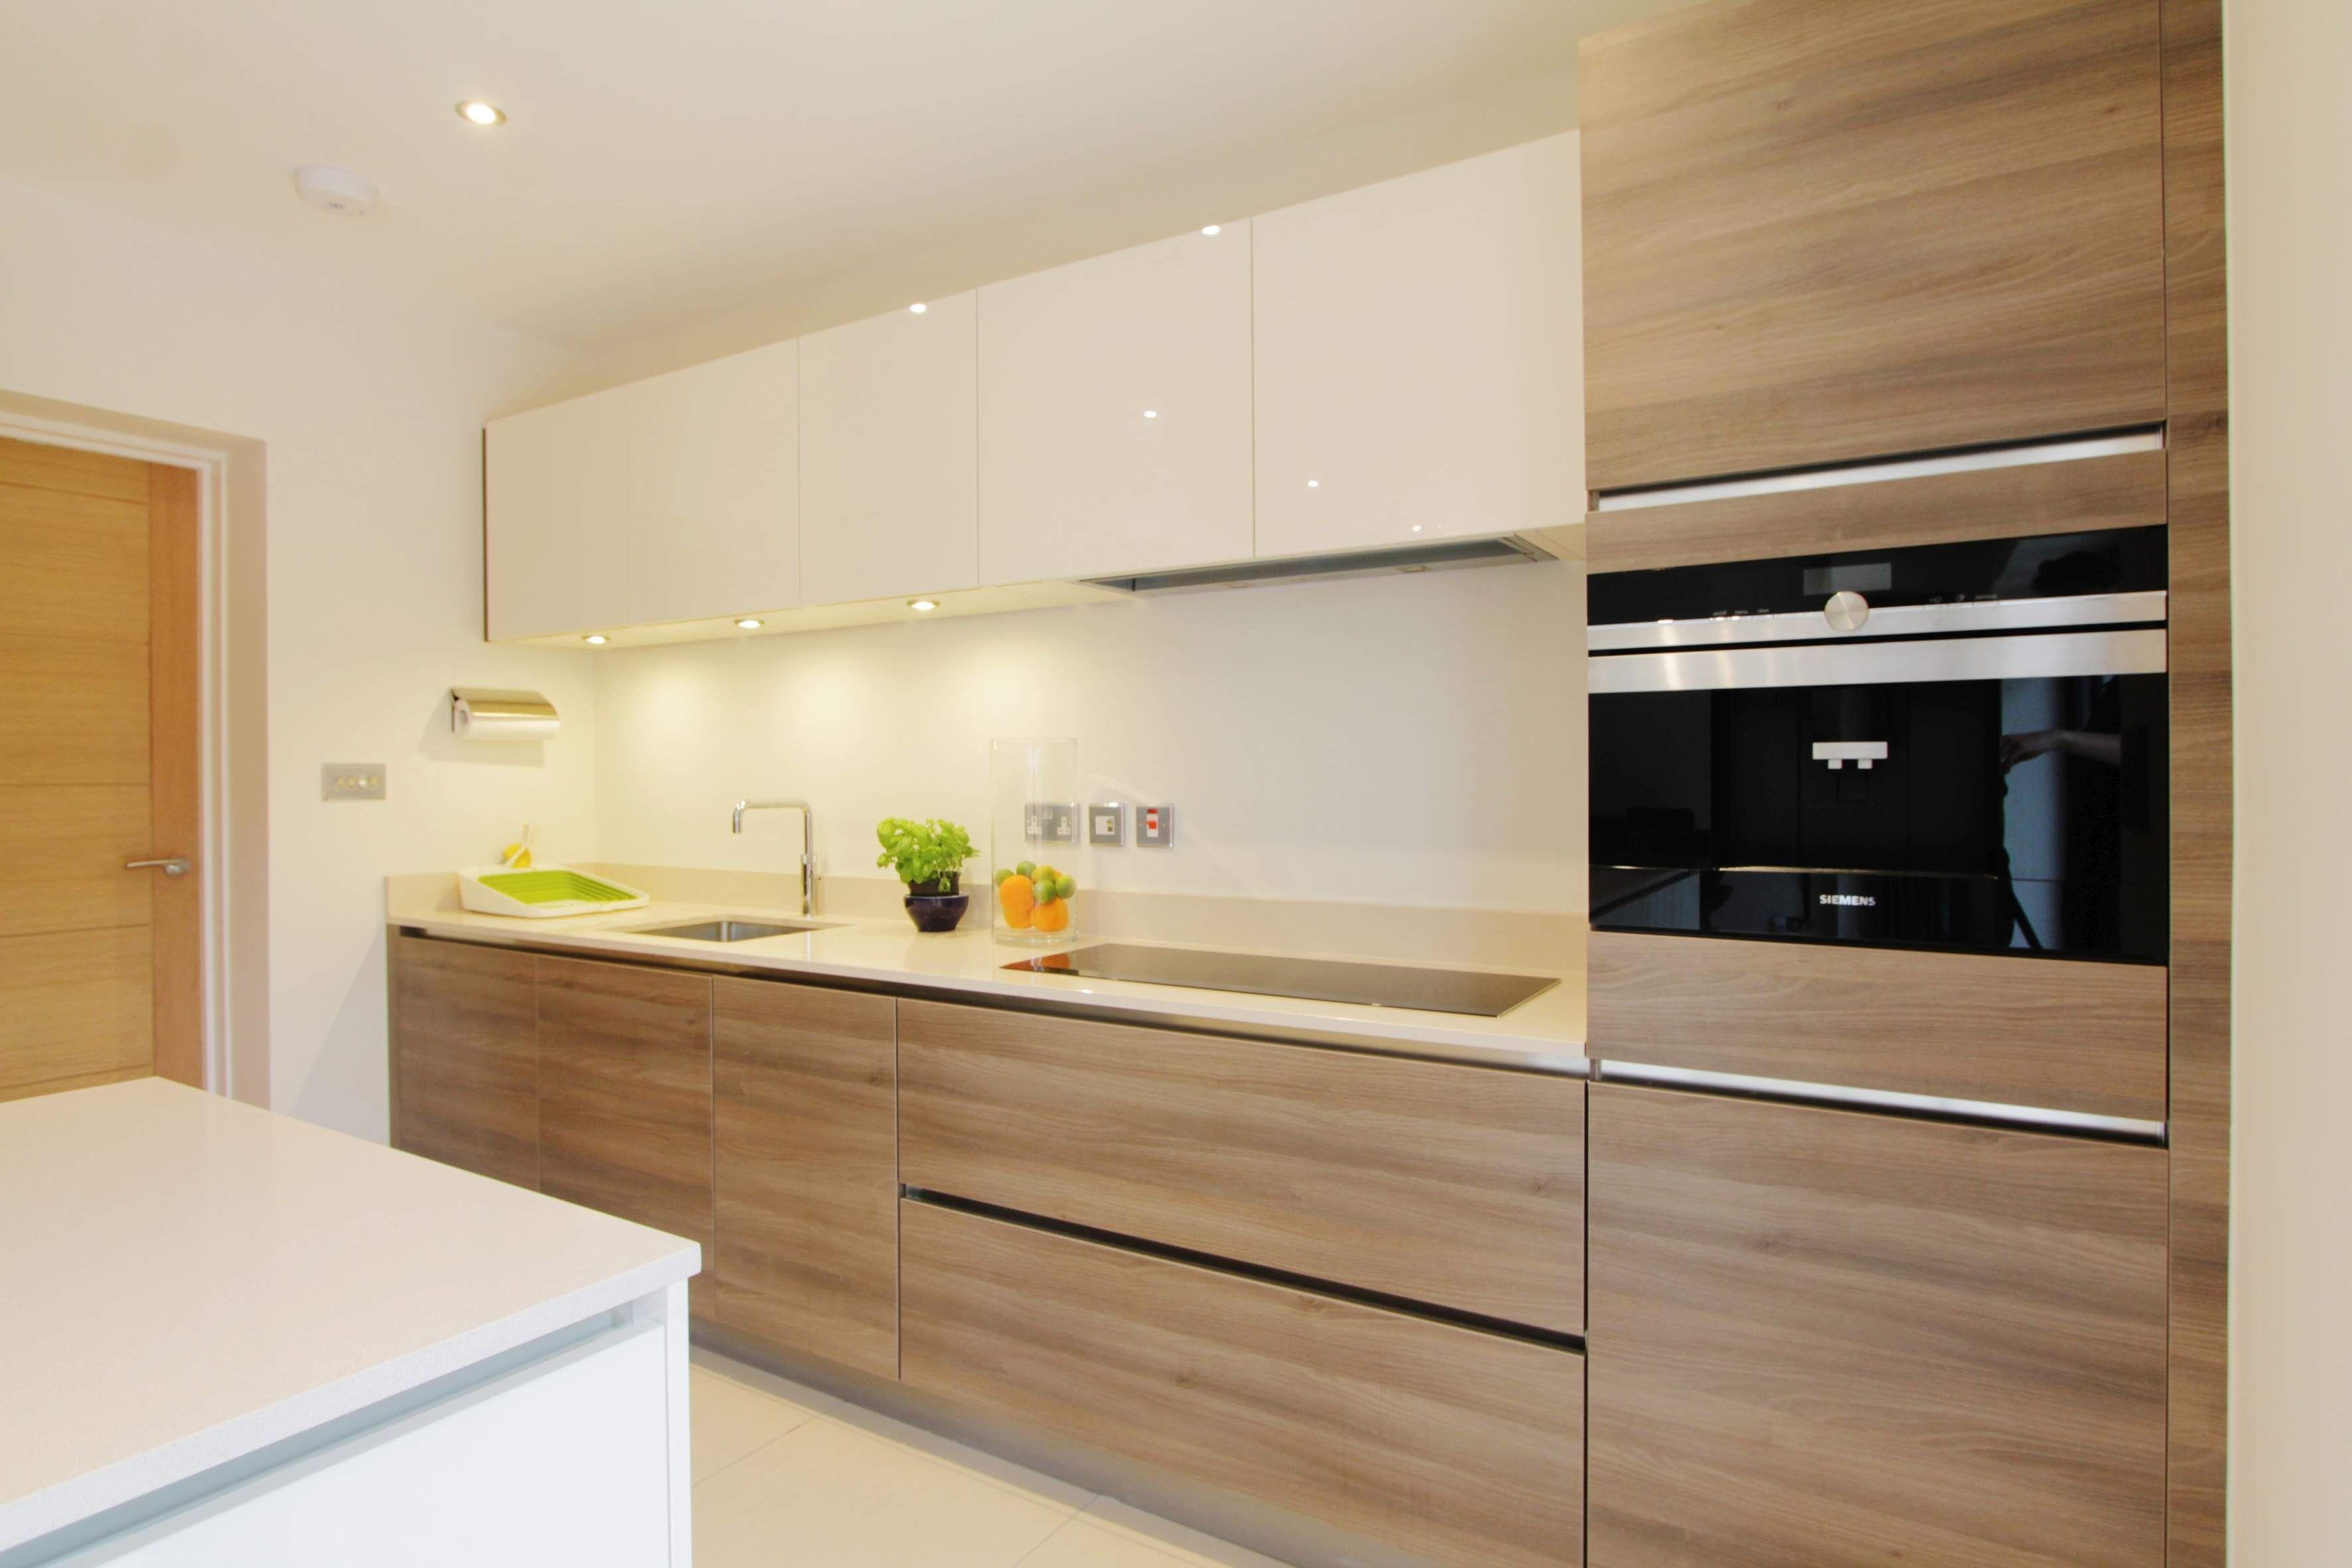 Pin von Acqua Kitchens auf Acqua - German Made Kitchens | Pinterest ...